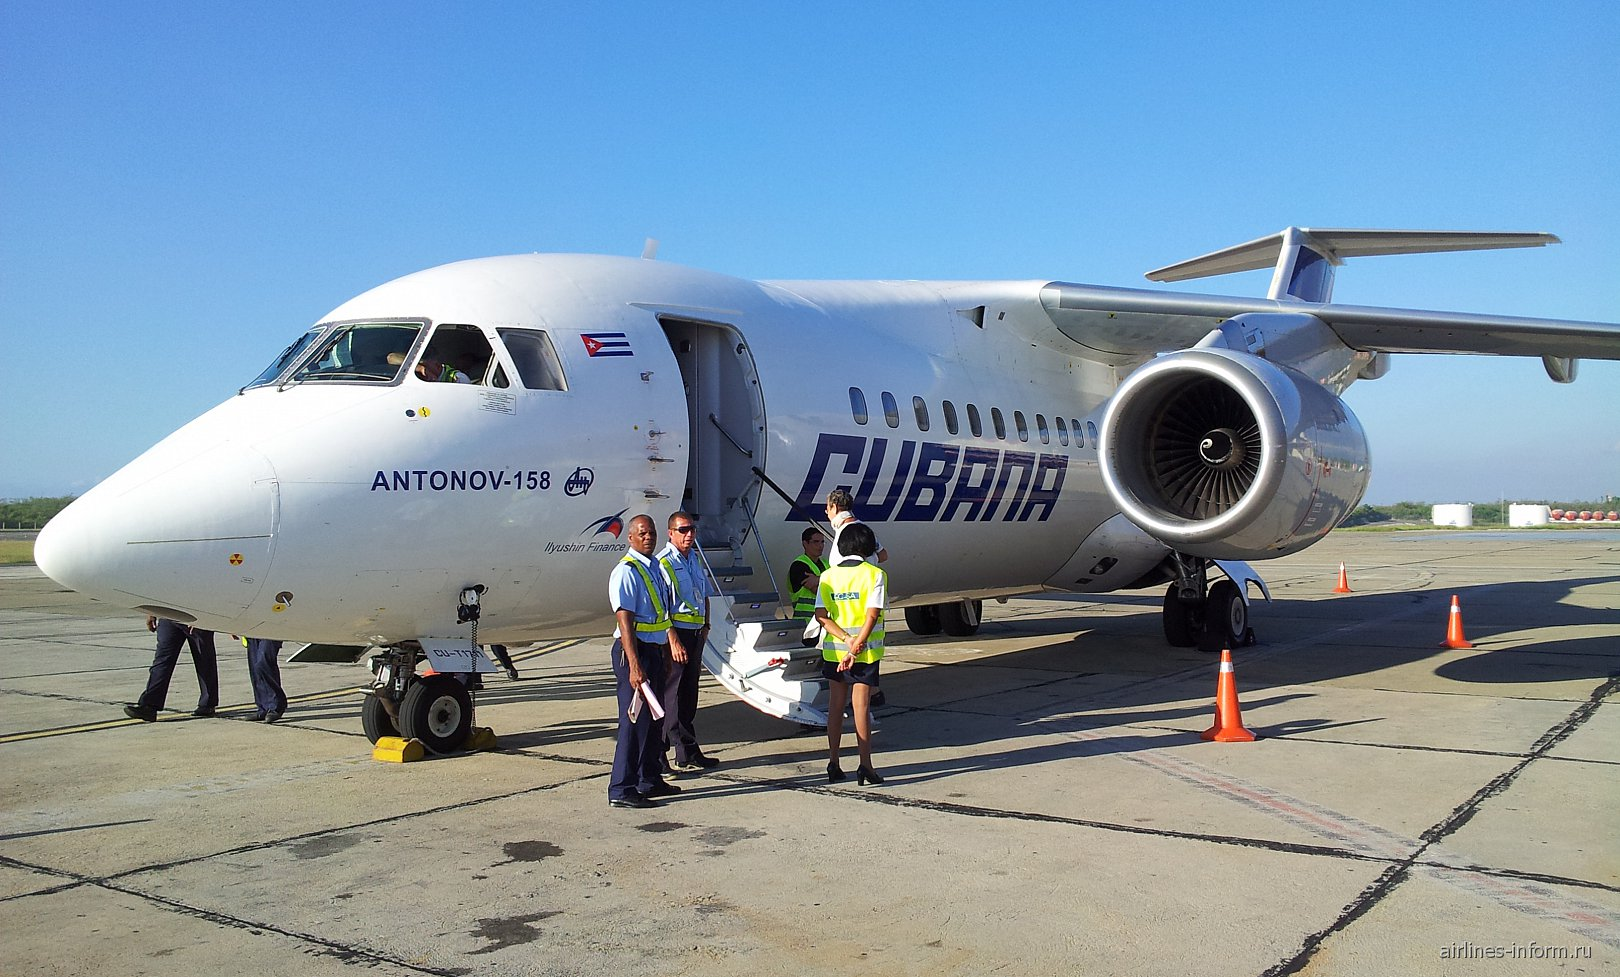 Сантьяго-де-Куба - Гавана на Ан-158  c Cubana de Aviacion (Кубана де Авиасьон)